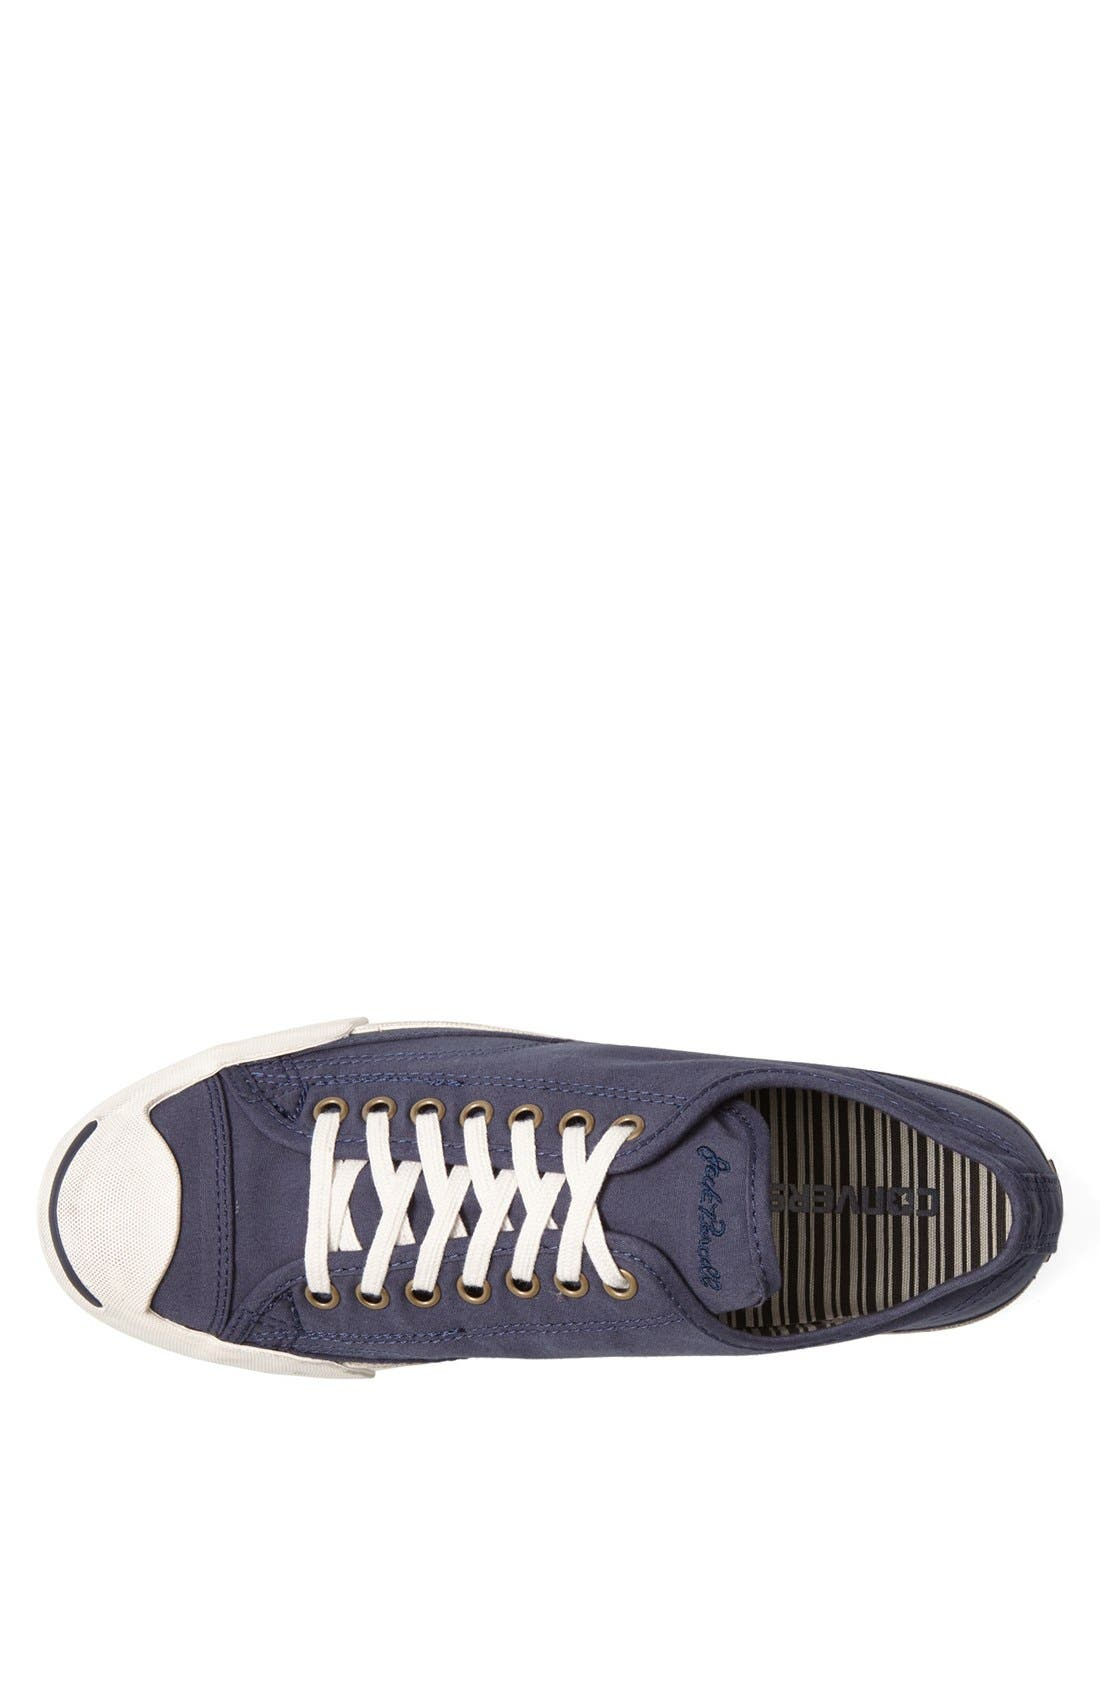 Alternate Image 3  - Converse 'Jack Purcell - Low' Sneaker (Men)